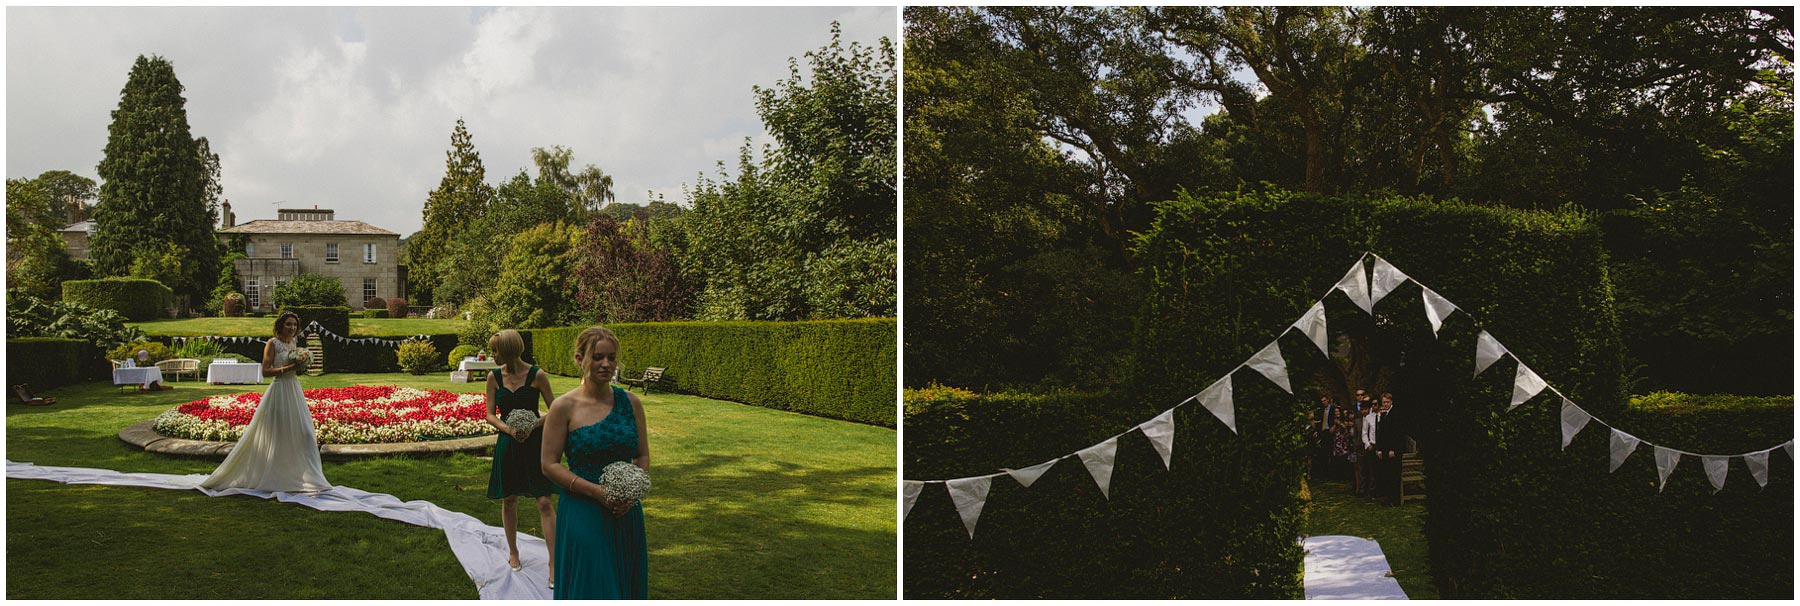 Colehayes-Park-Wedding-Photography_0064